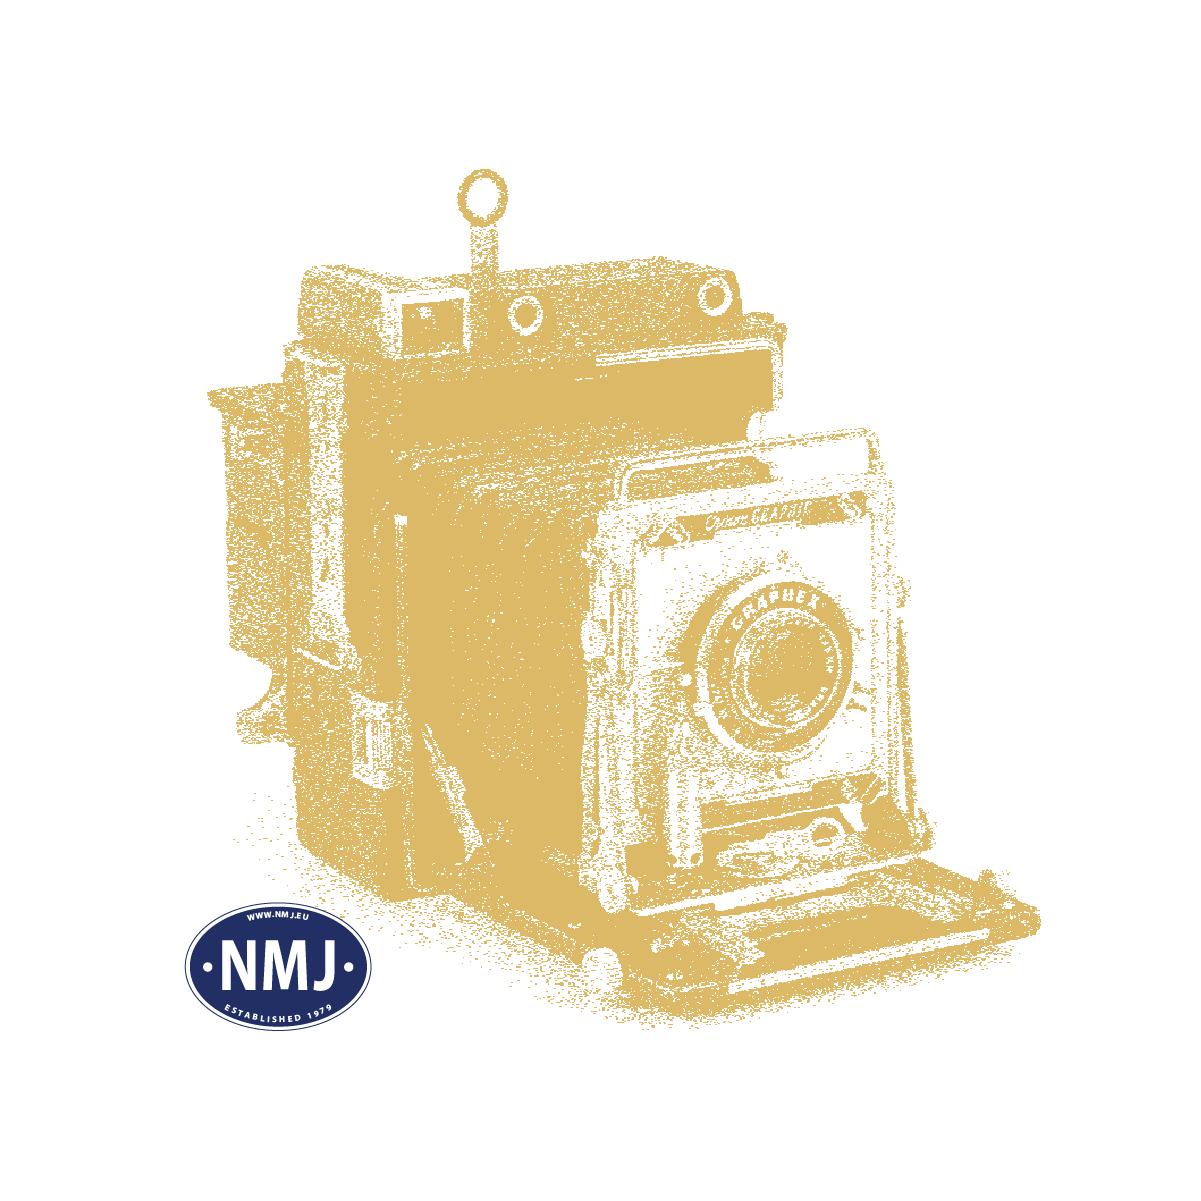 NMJT145401 - NMJ Topline SNCB Diesellok 204003, Spur 0